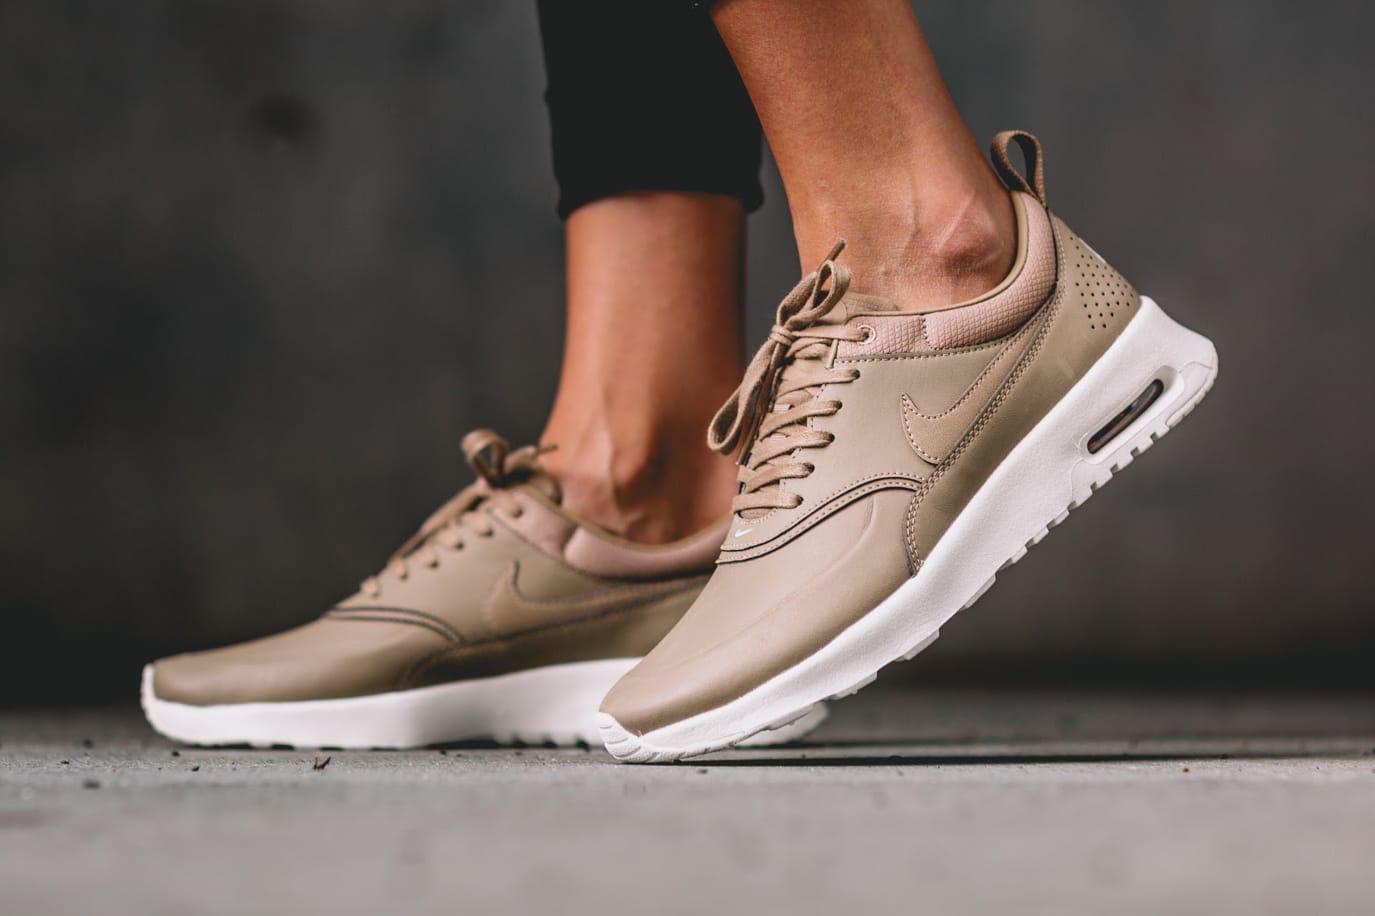 Nike Air Max Thea Premium Desert Camo